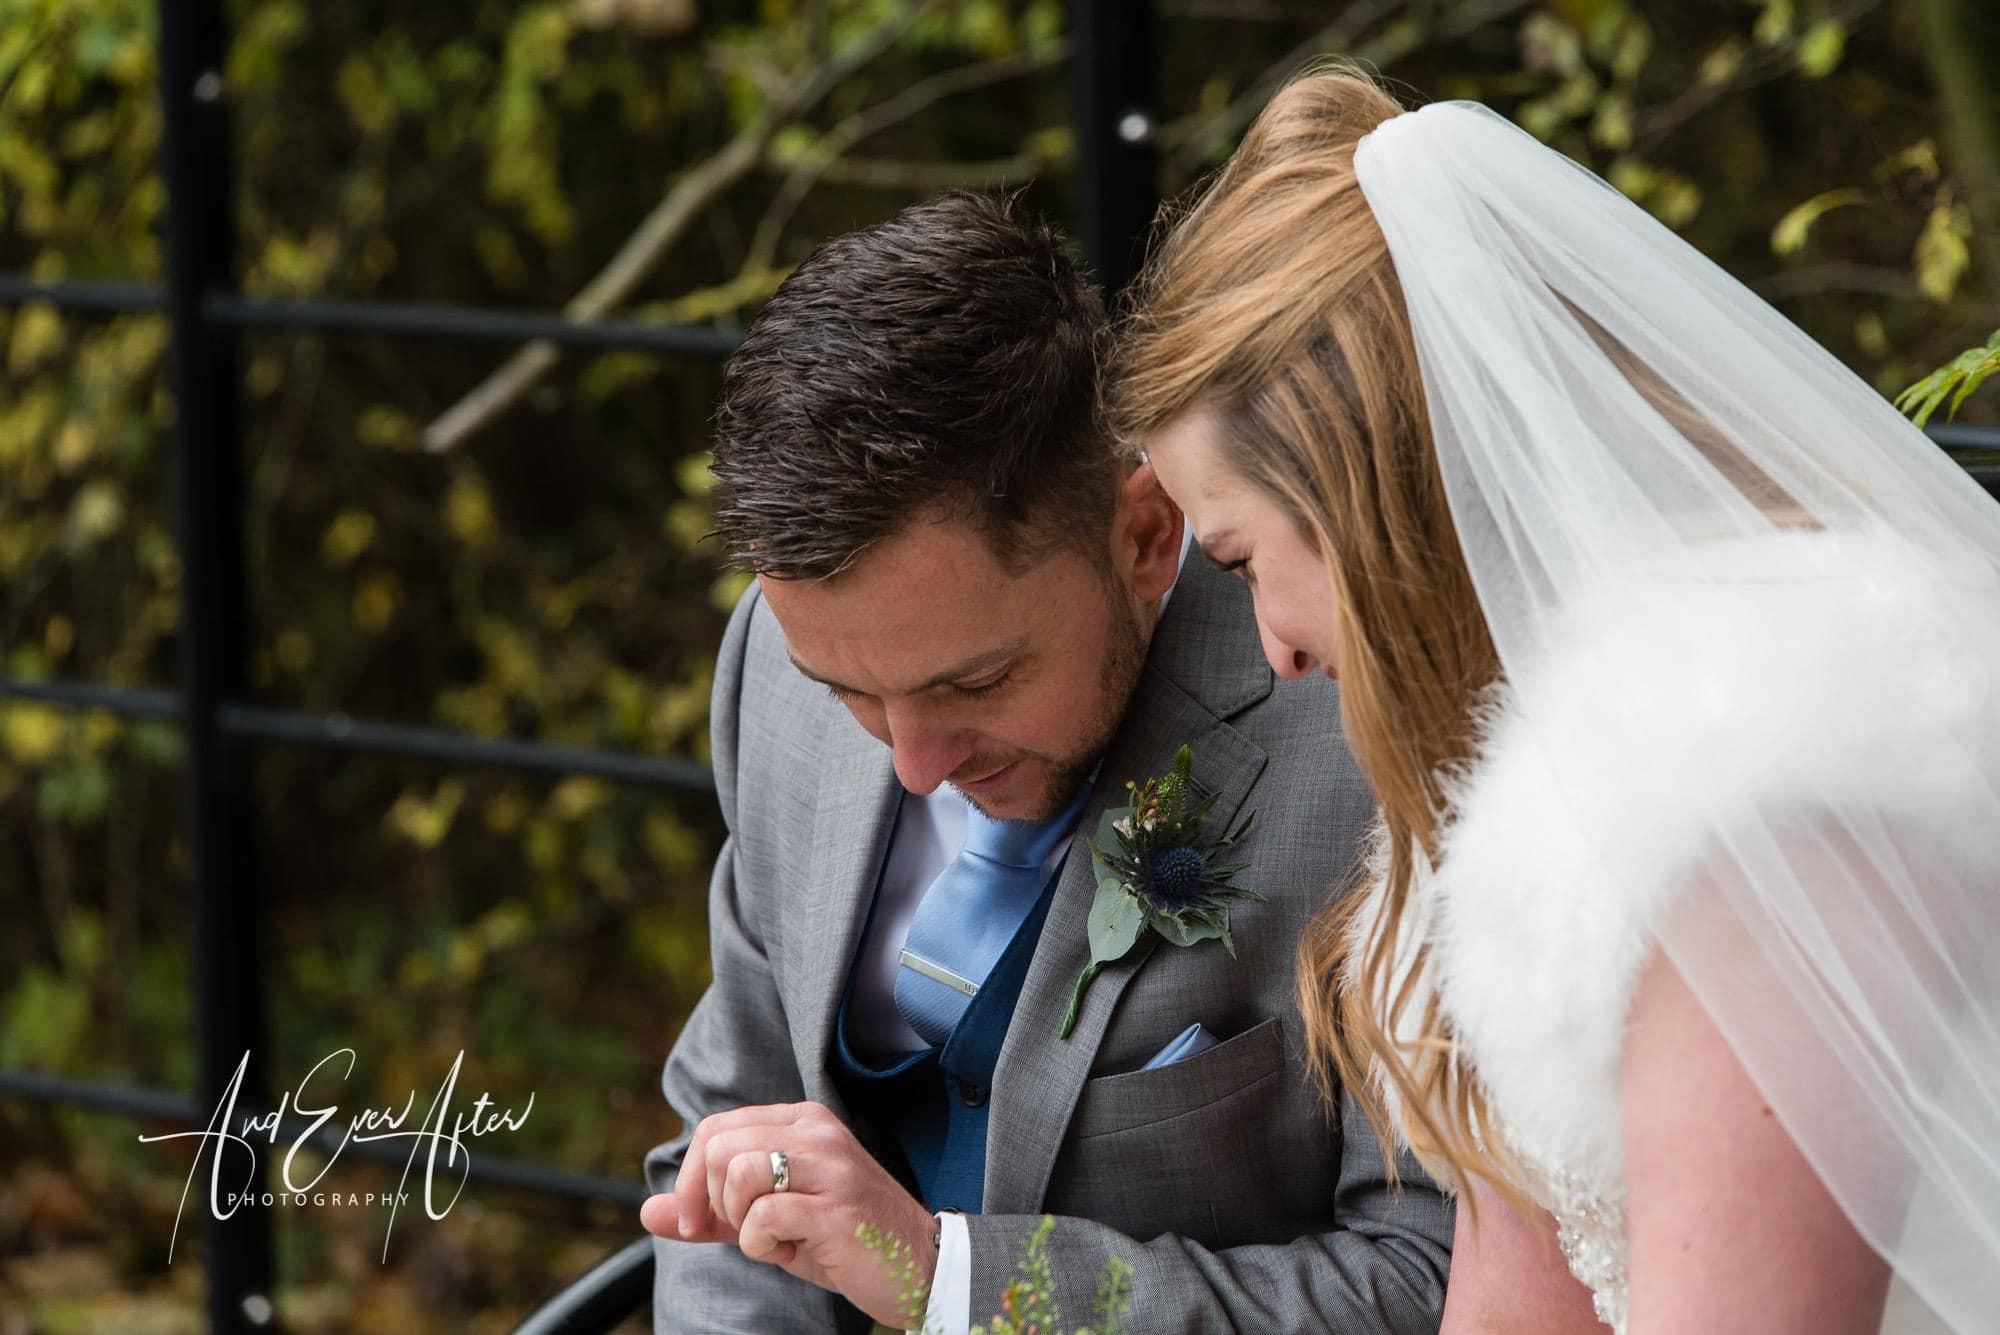 bride, groom, wedding ring